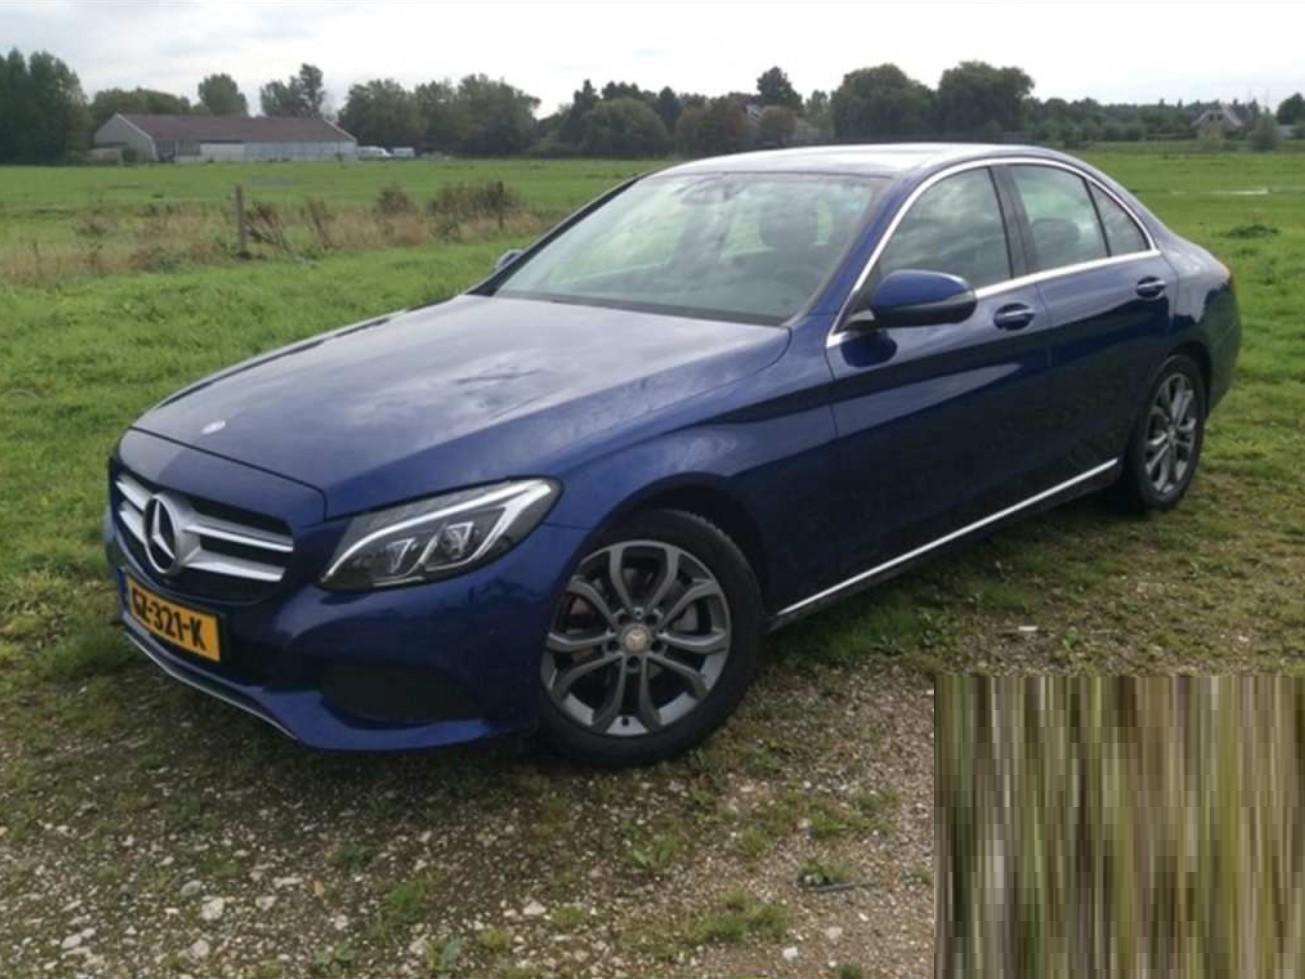 Mercedes-benz C-klasse 180 cdi lease edition *navi+pdc+ecc+cruise*